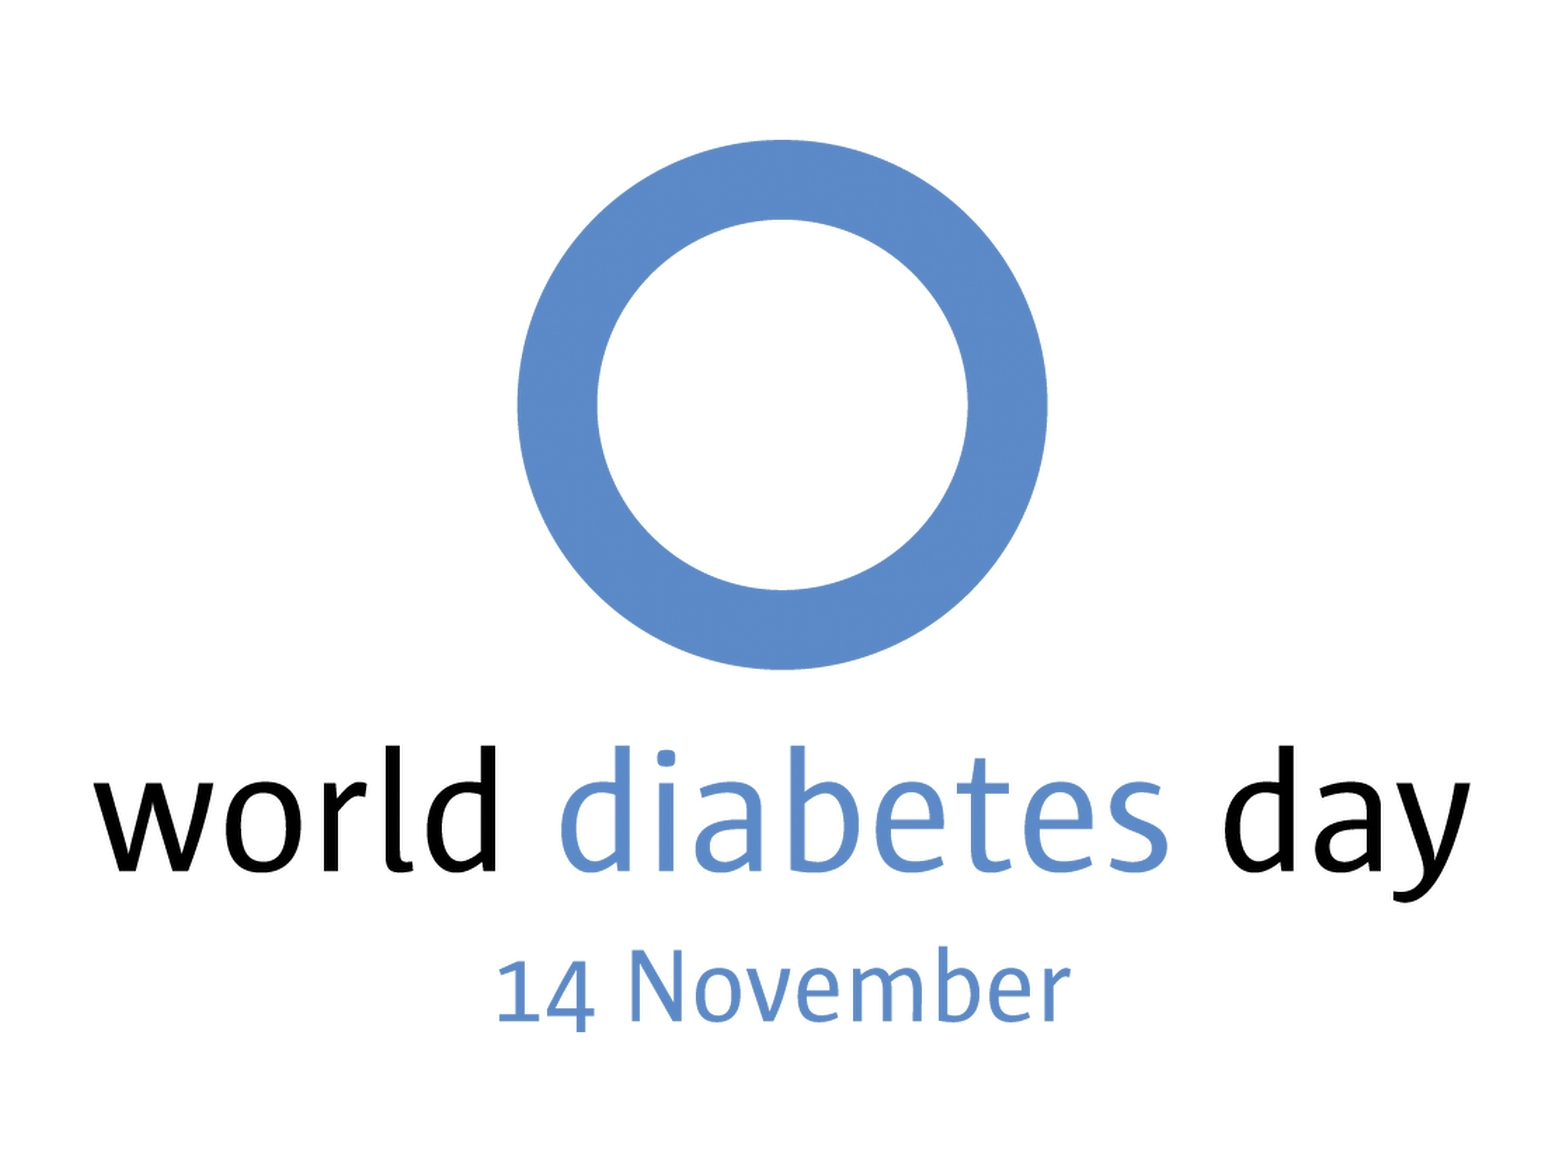 RESOURCE: World Diabetes Day – November 14 2017